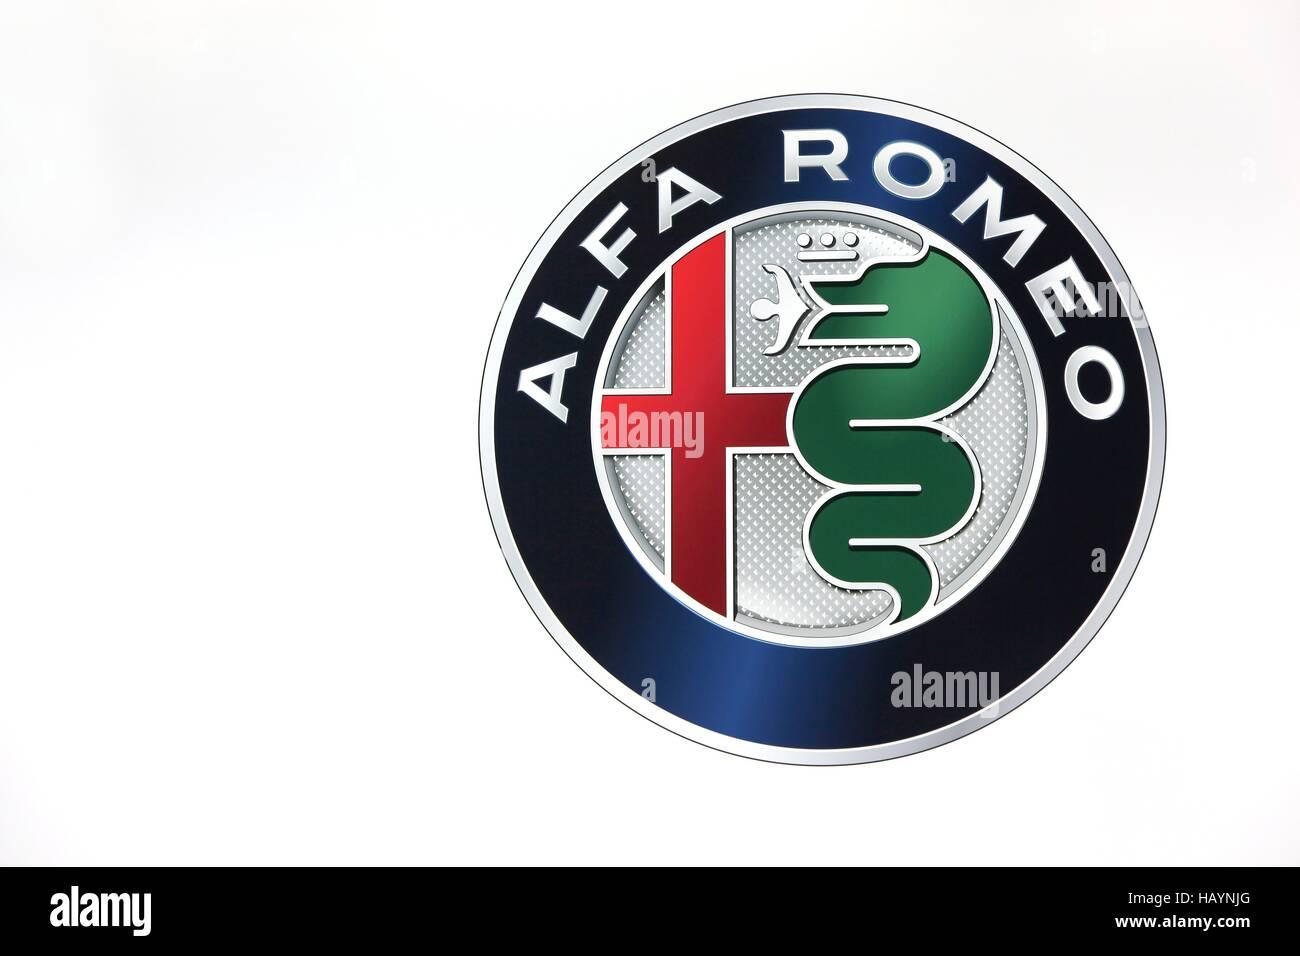 Alfa Romeo Logo auf einer Wand Stockbild